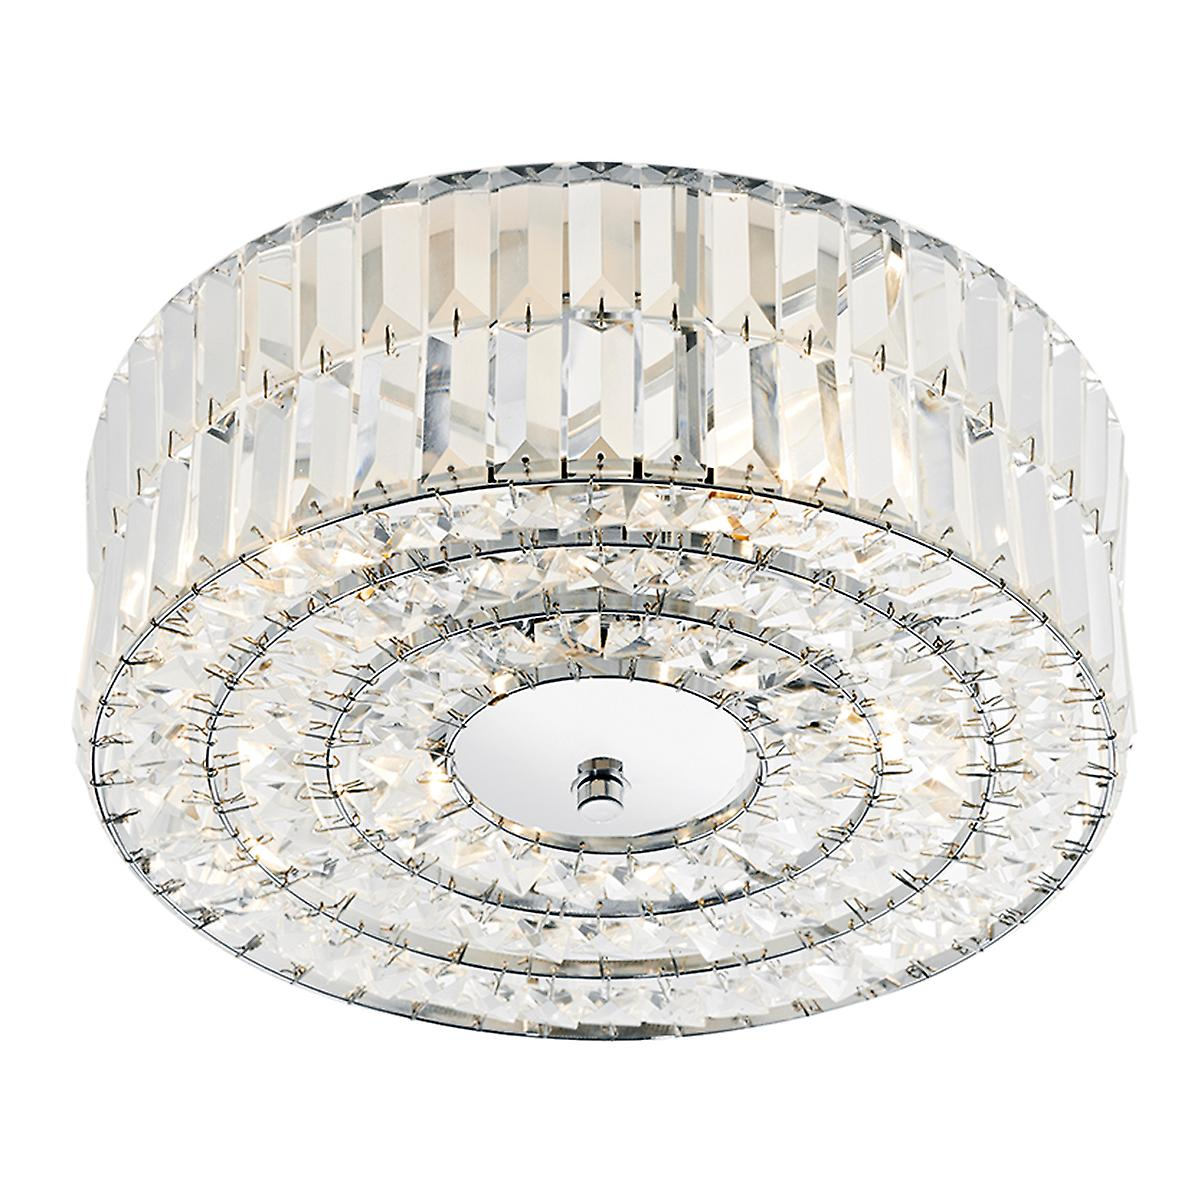 Dar ERR5250 Errol Contemporary Crystal Semi-Flush Ceiling Light